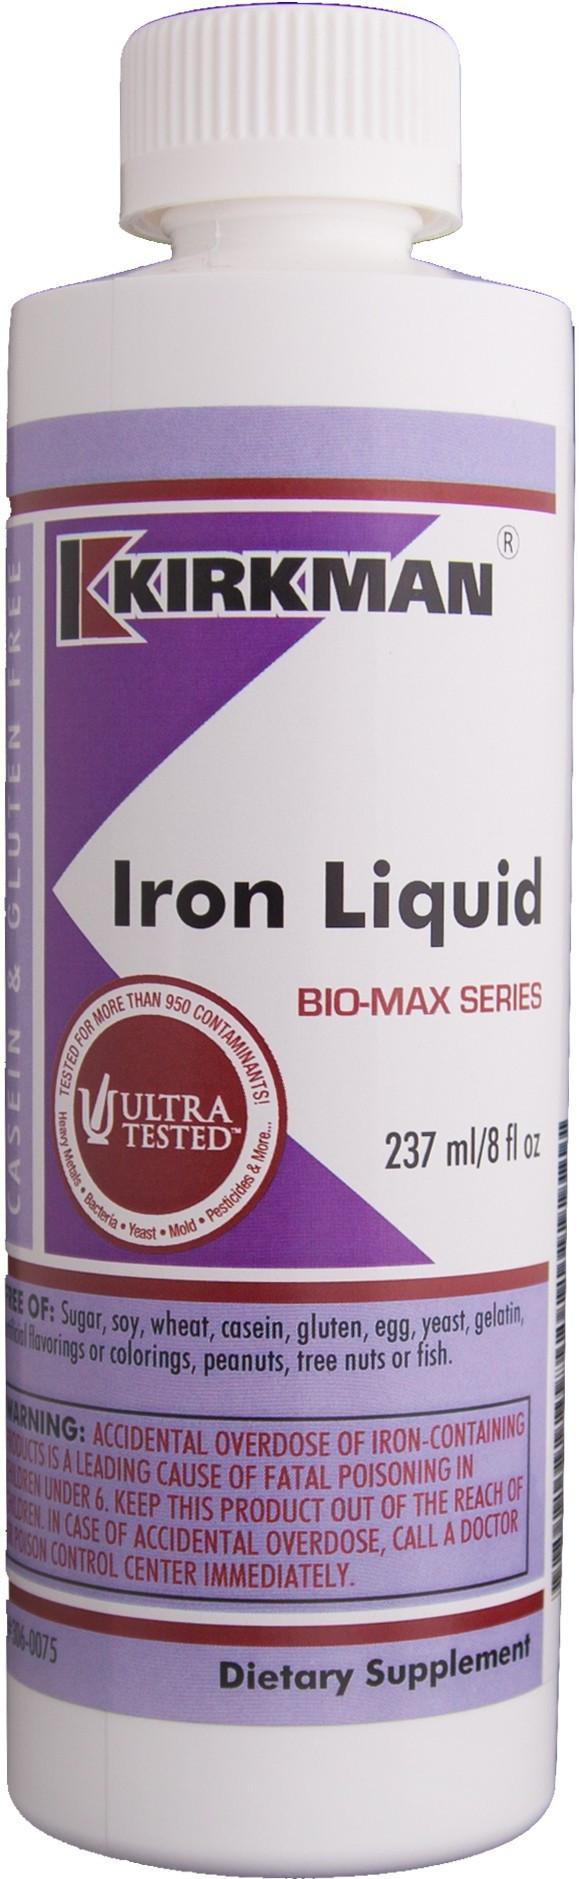 Iron Liquid Bio-Max Series 237ml